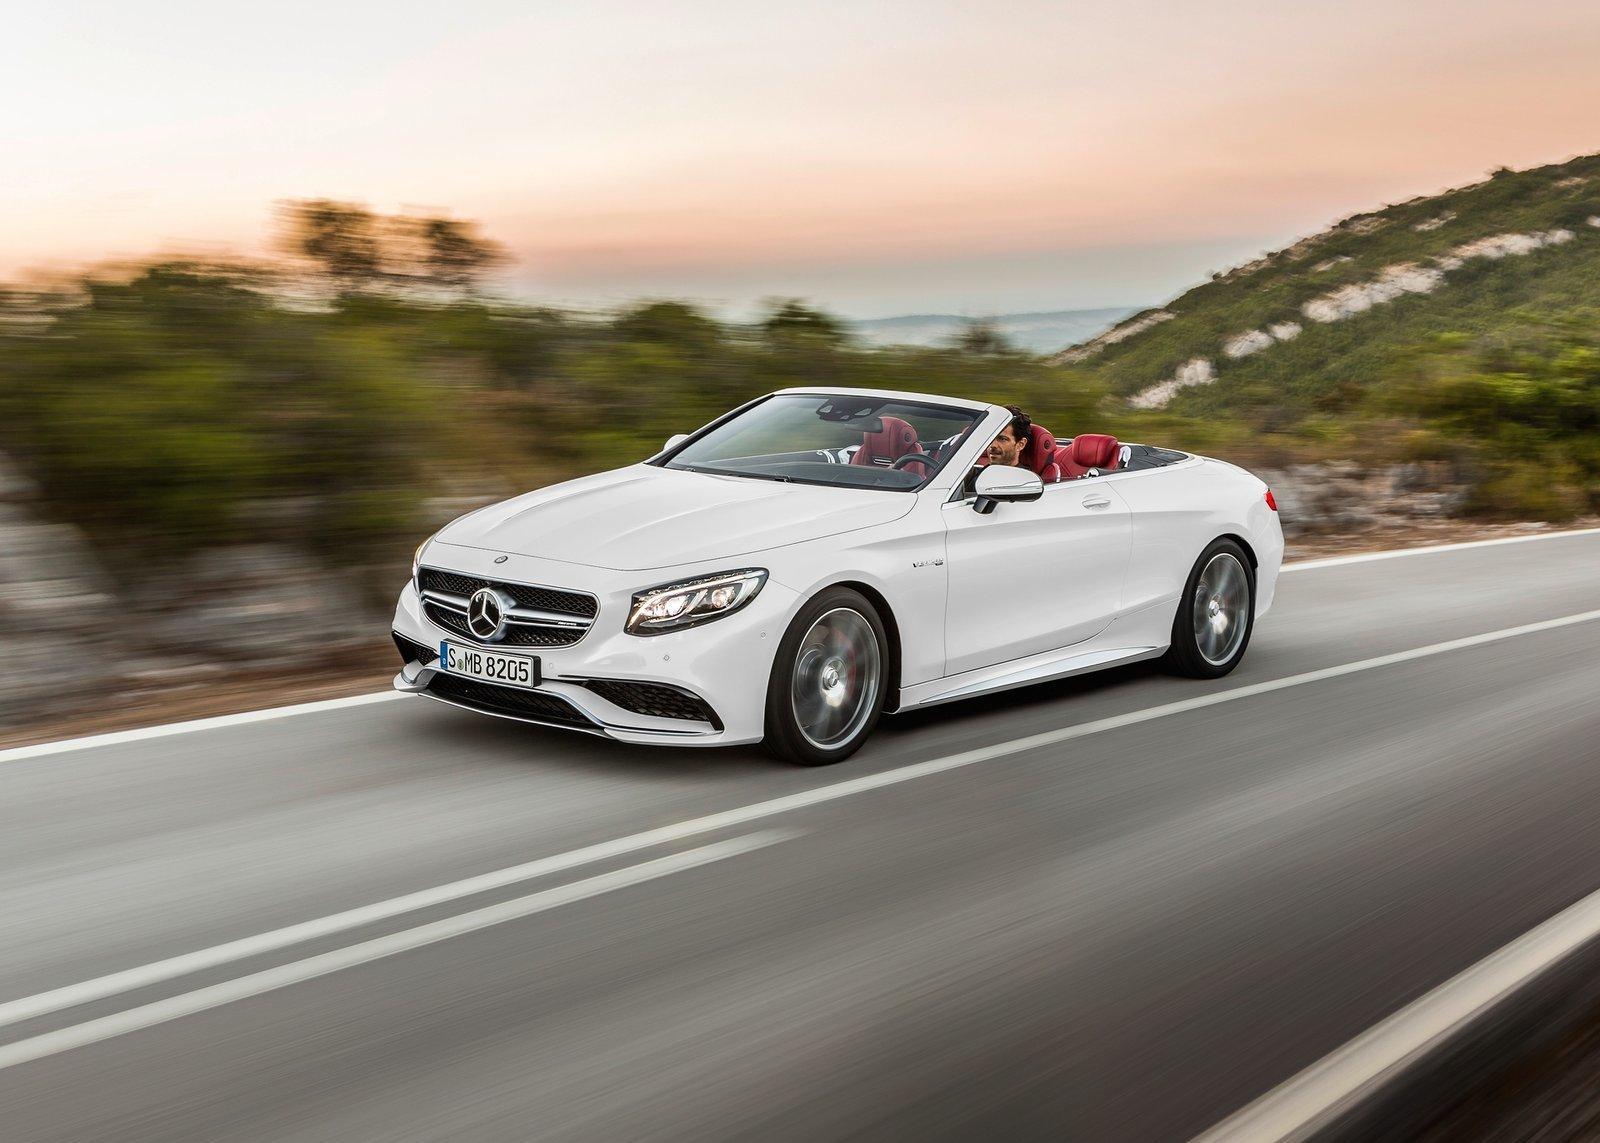 Foto de Mercedes-AMG S 63 Cabriolet (6/19)